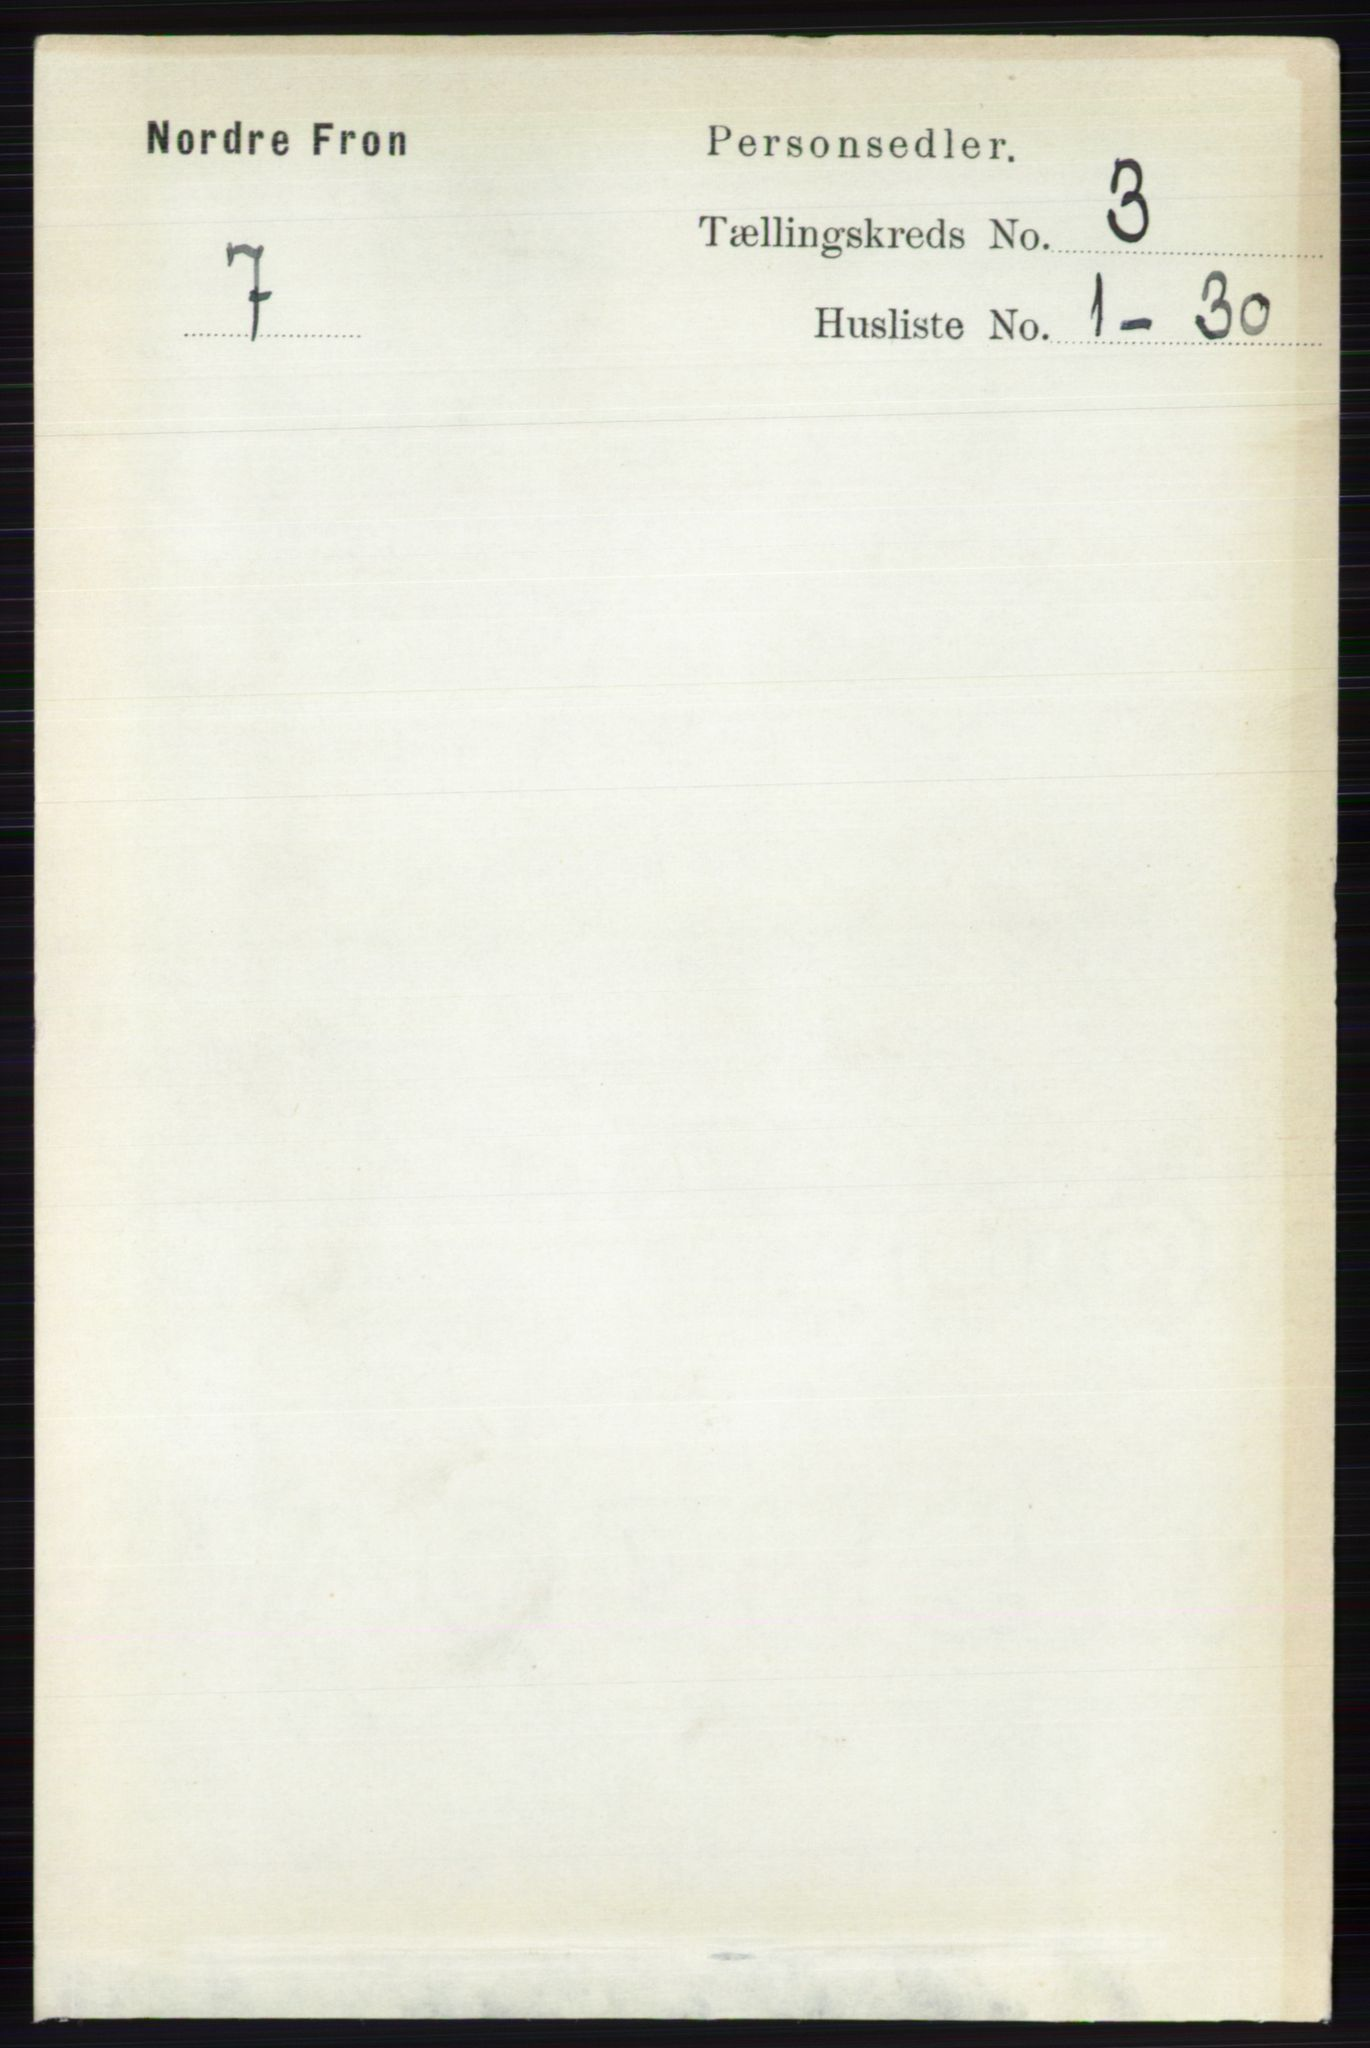 RA, Folketelling 1891 for 0518 Nord-Fron herred, 1891, s. 842